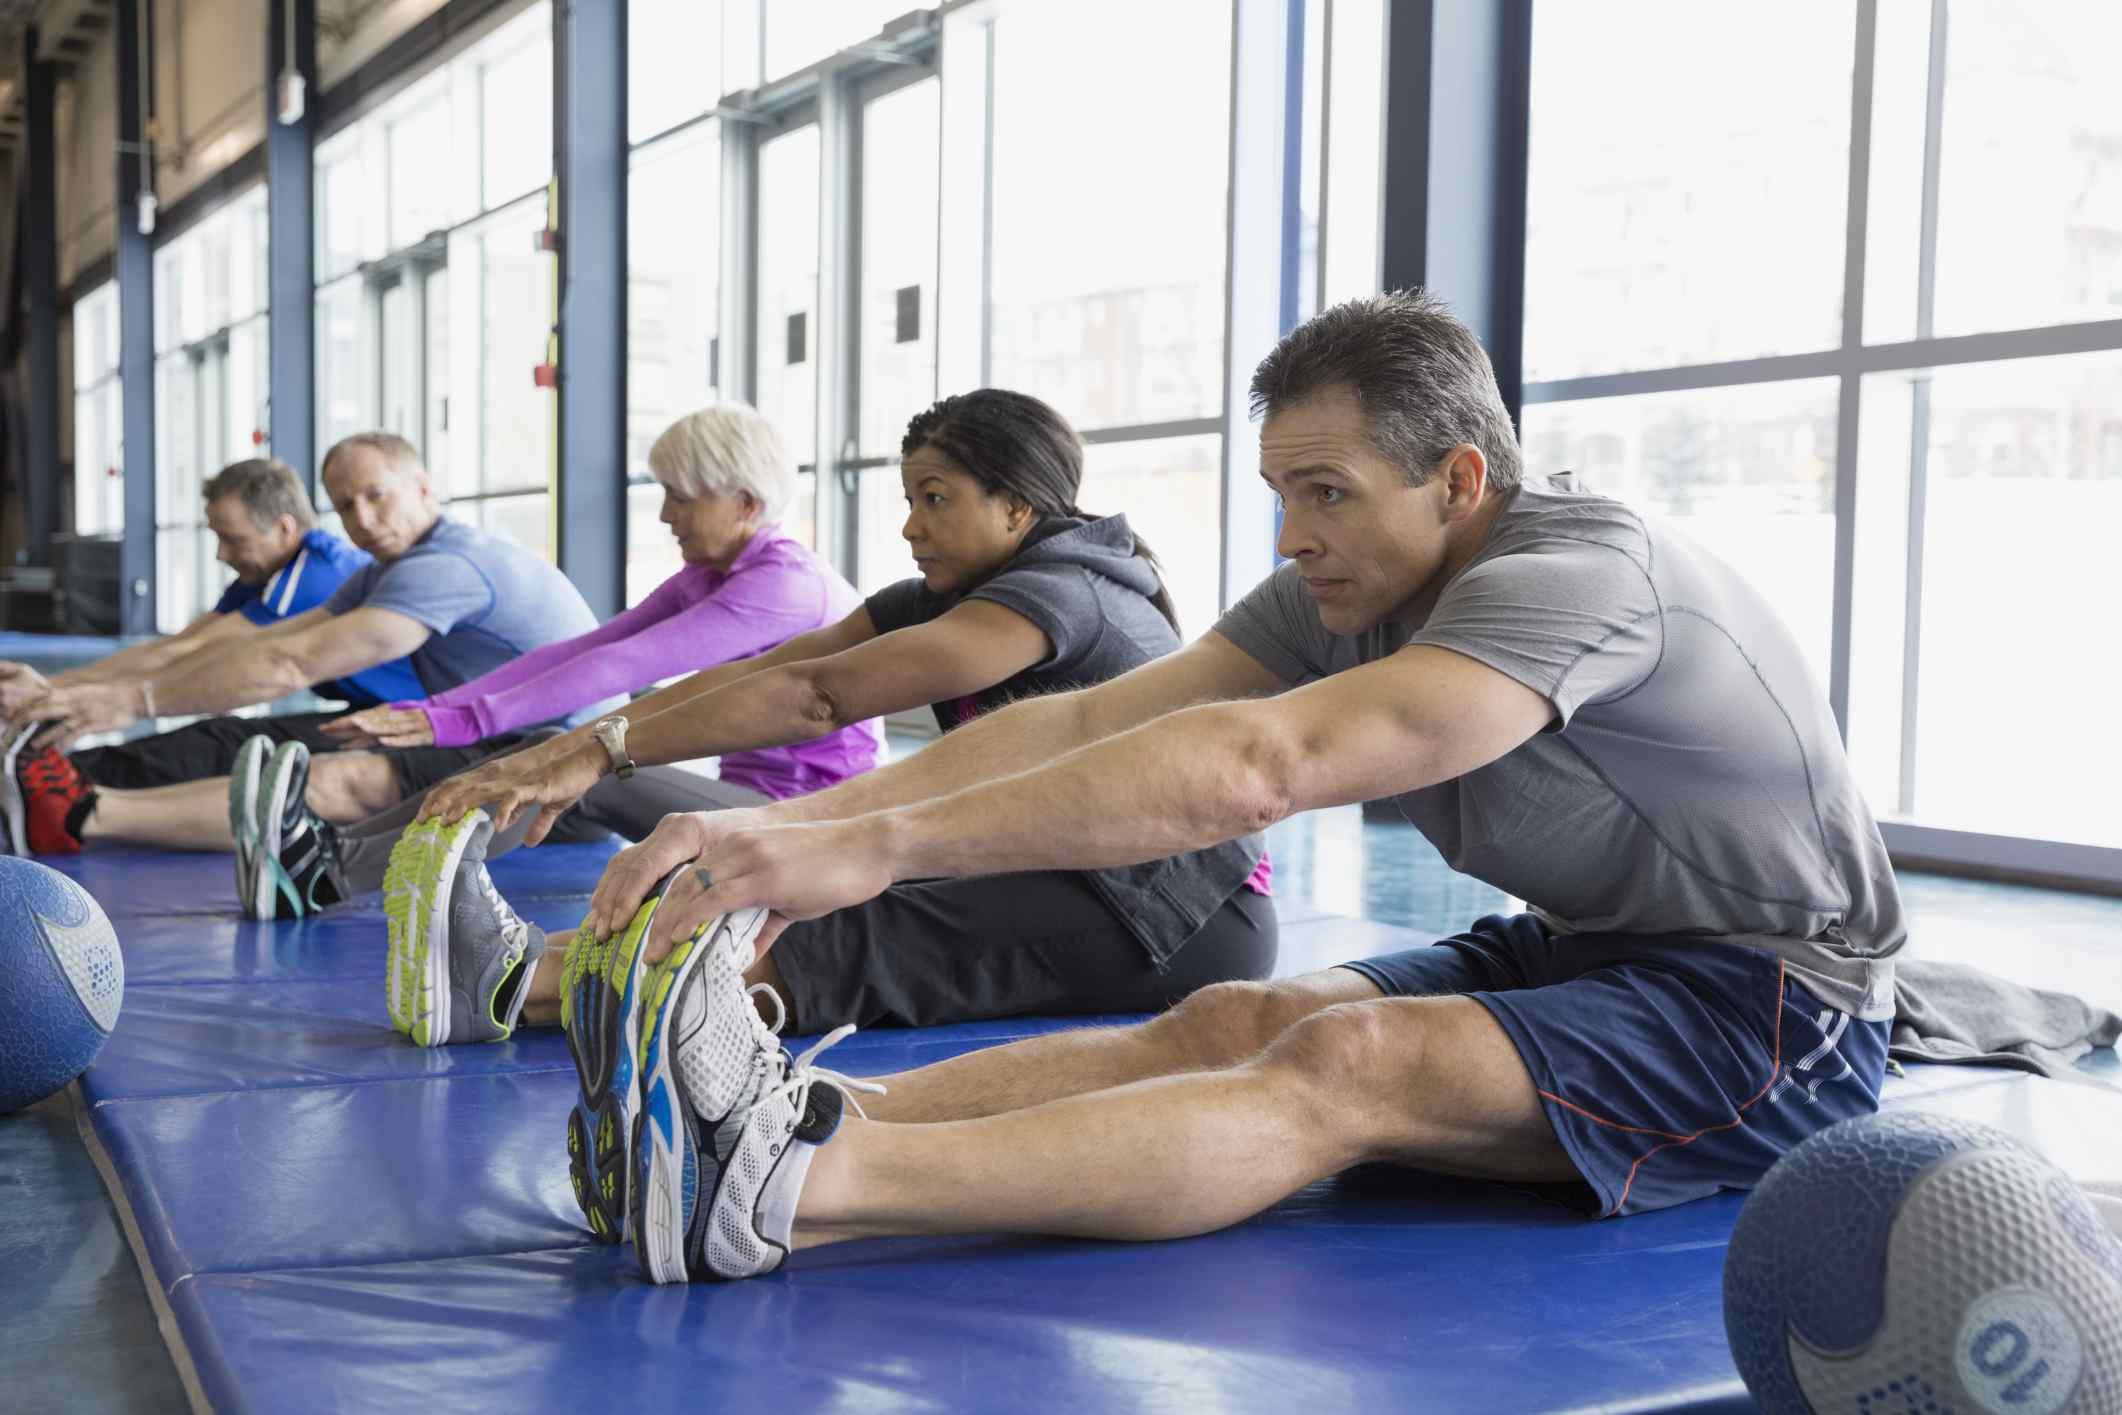 Inner Thigh Fitness Tips For Your Backache